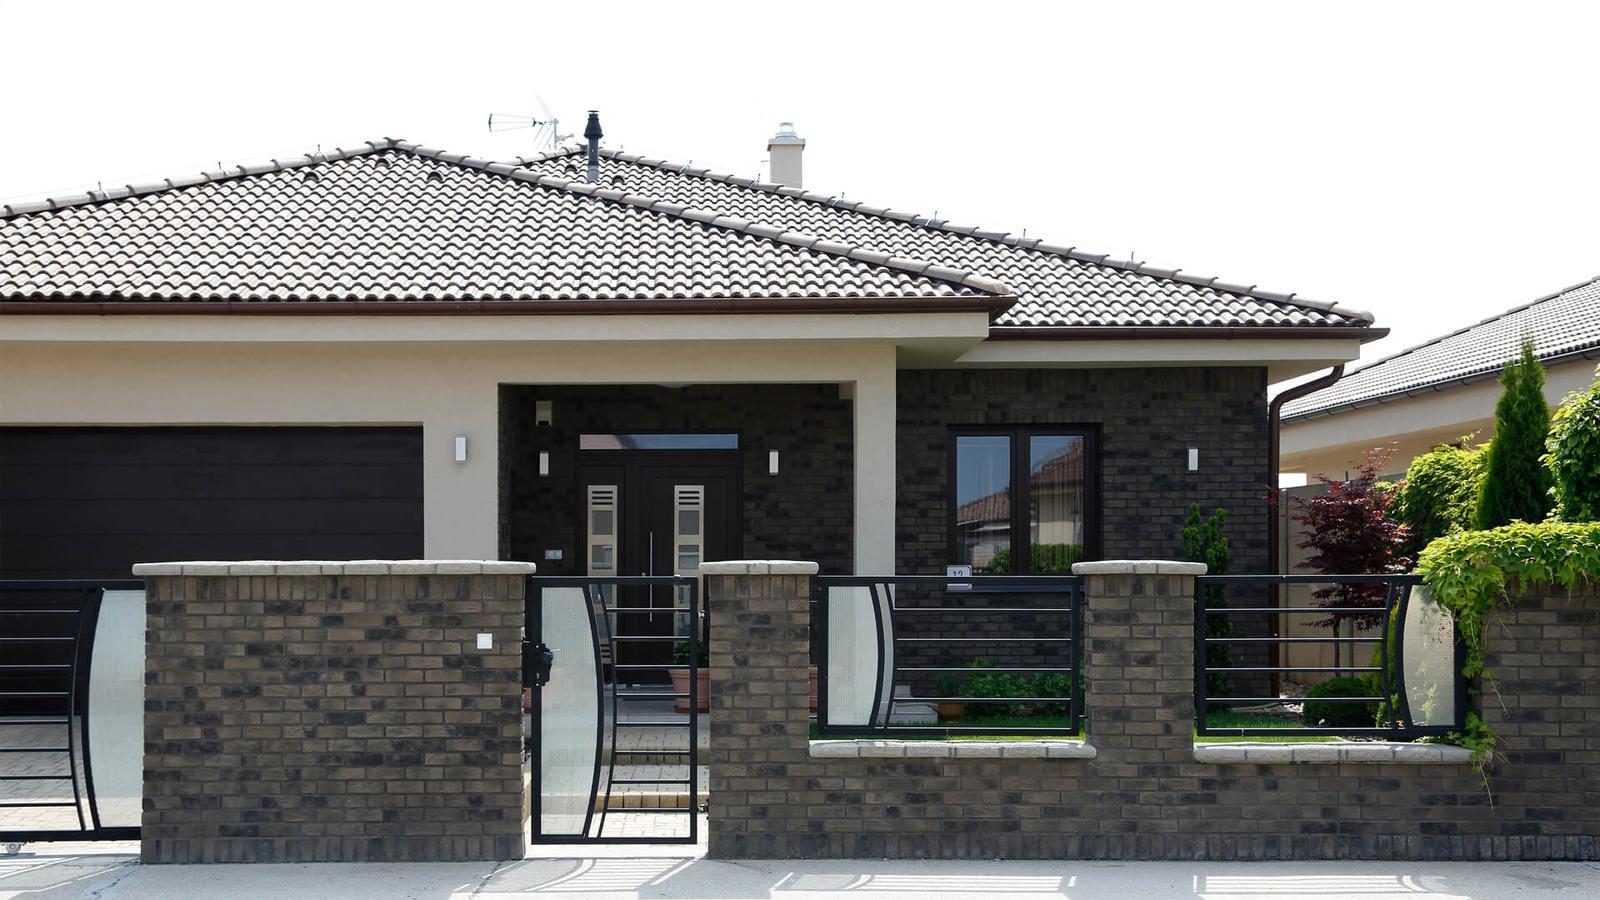 tehlové a  kamenné obklady  - REALIZACIE - tehl. obklad country 618, cenníková cena 22 eur/m2 , zlavy až do výšky 15 %